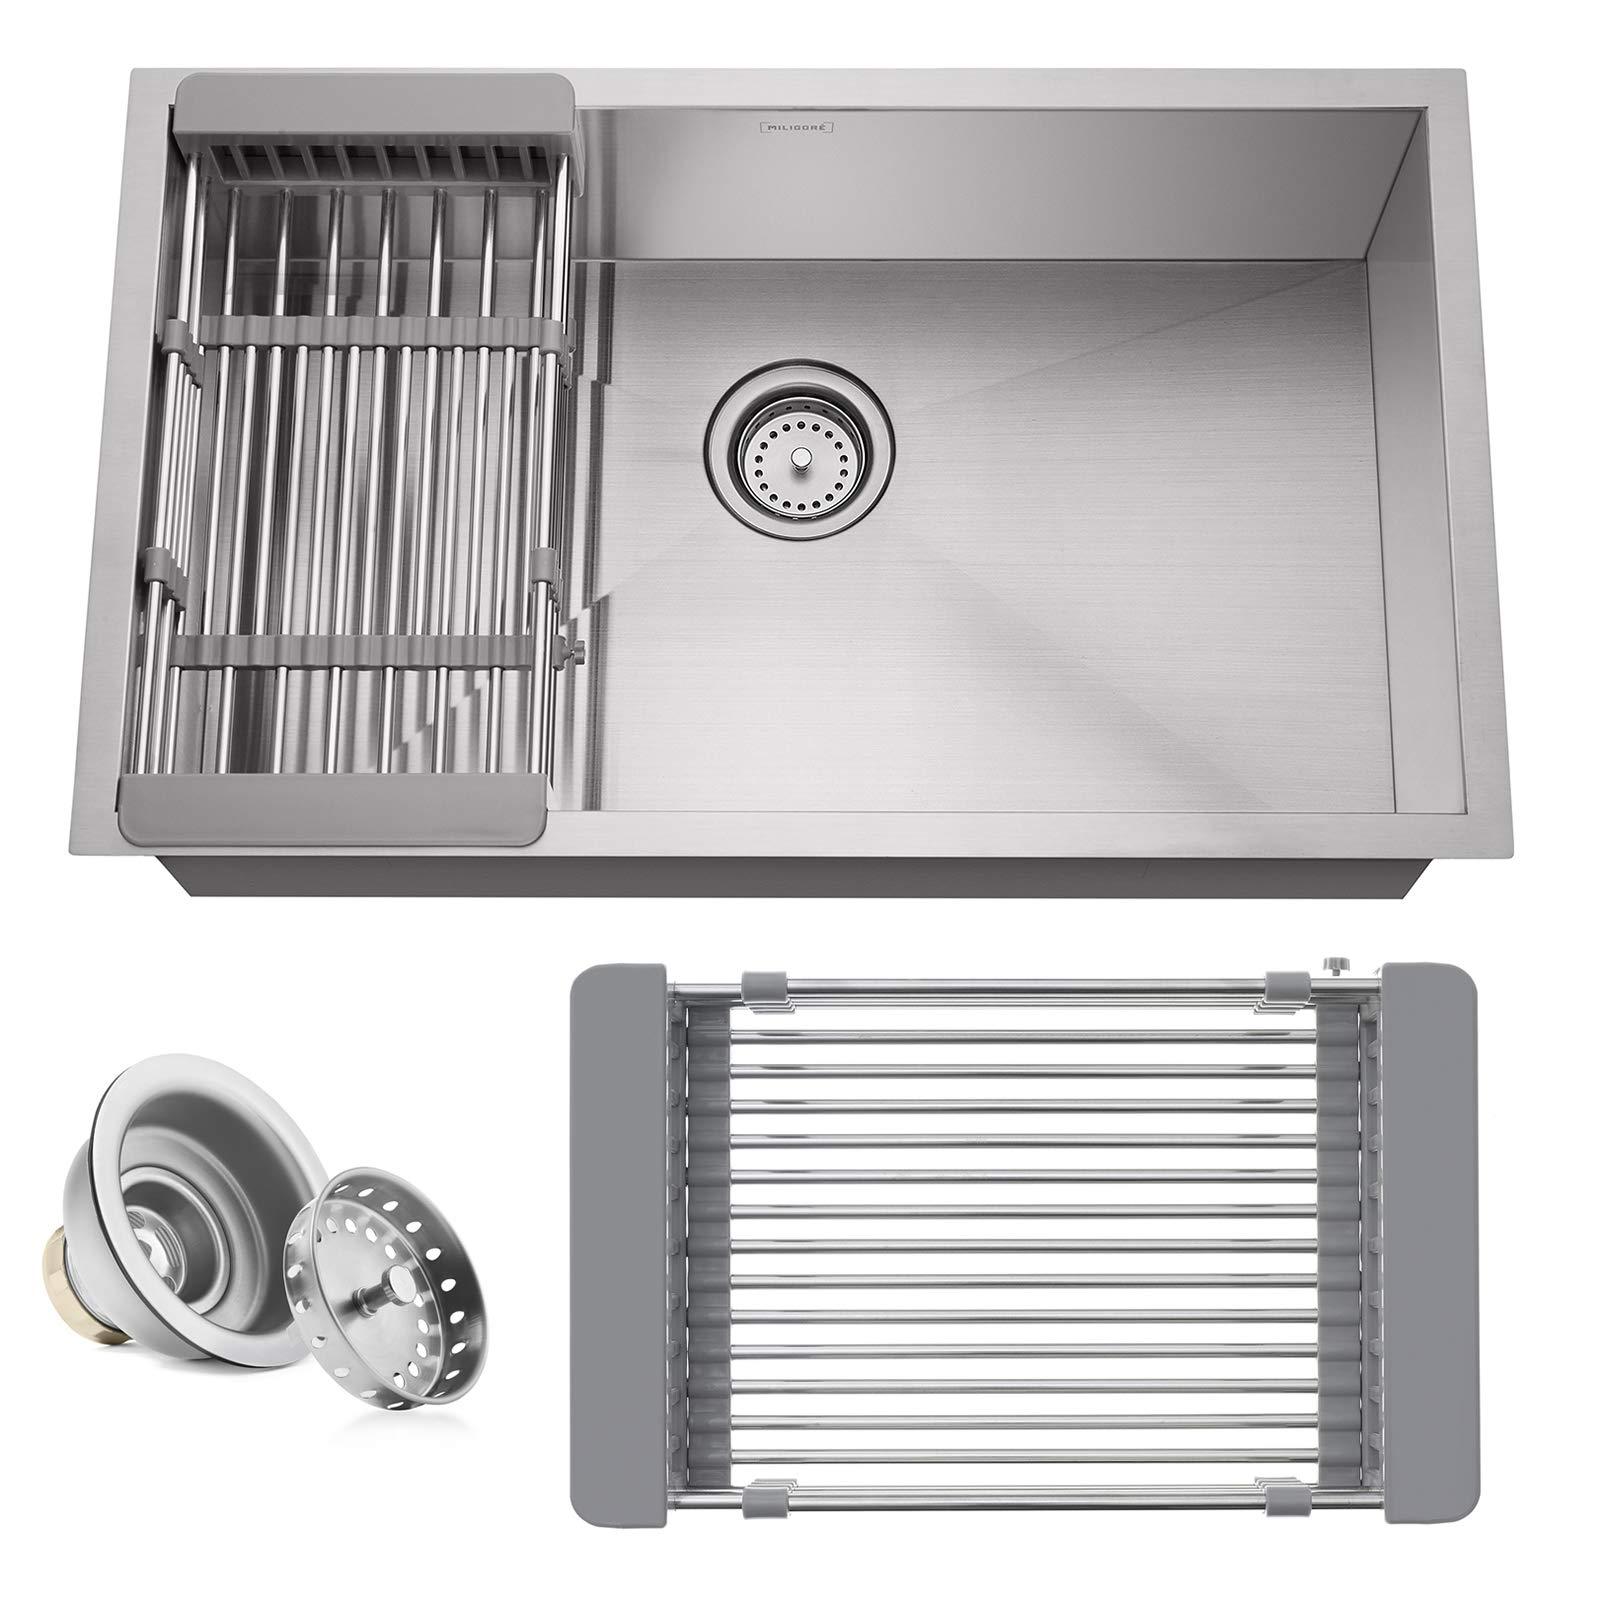 Miligore 30'' x 18'' x 9'' Deep Single Bowl Undermount Zero Radius Stainless Steel Kitchen Sink - Includes Drain/Adjustable Dish Rack by Miligore (Image #5)